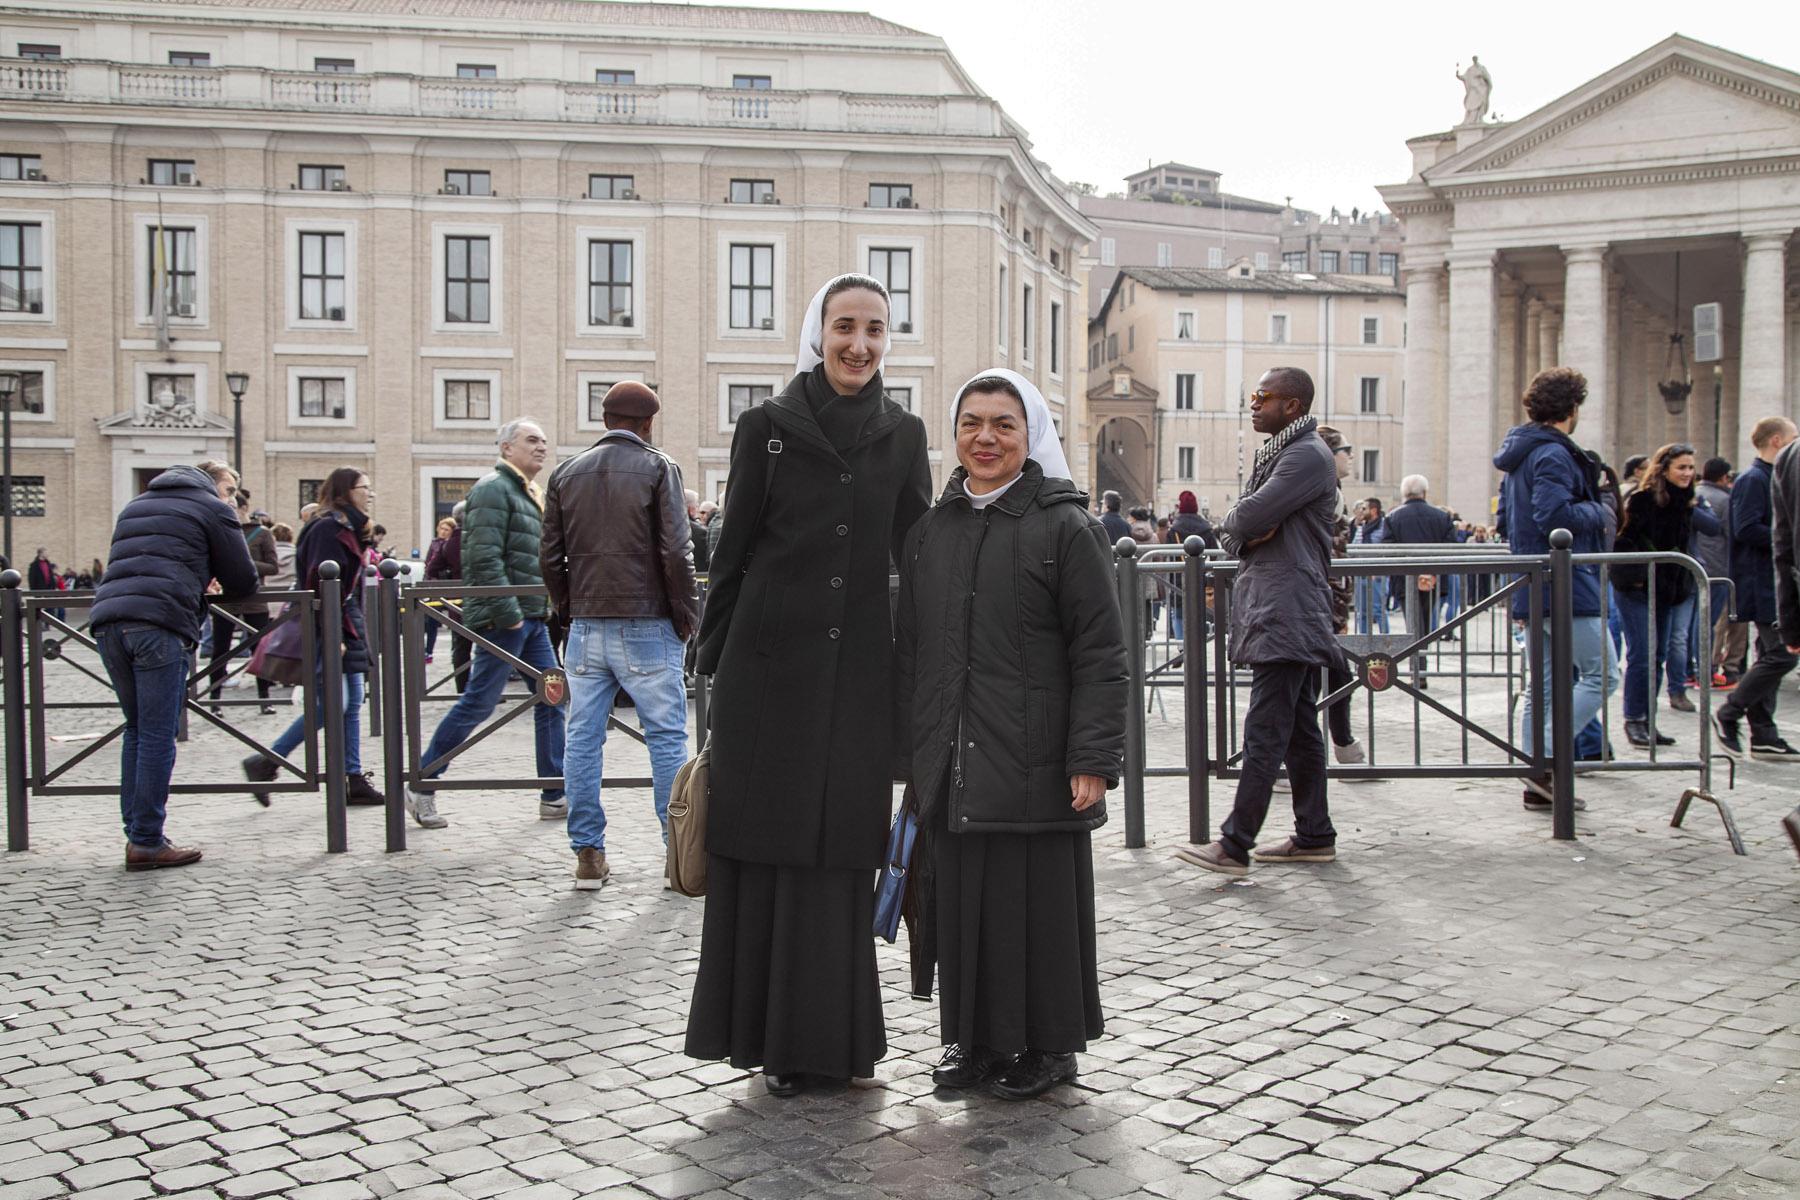 Chiara Spaghetti Kurtovic Popes Two 9